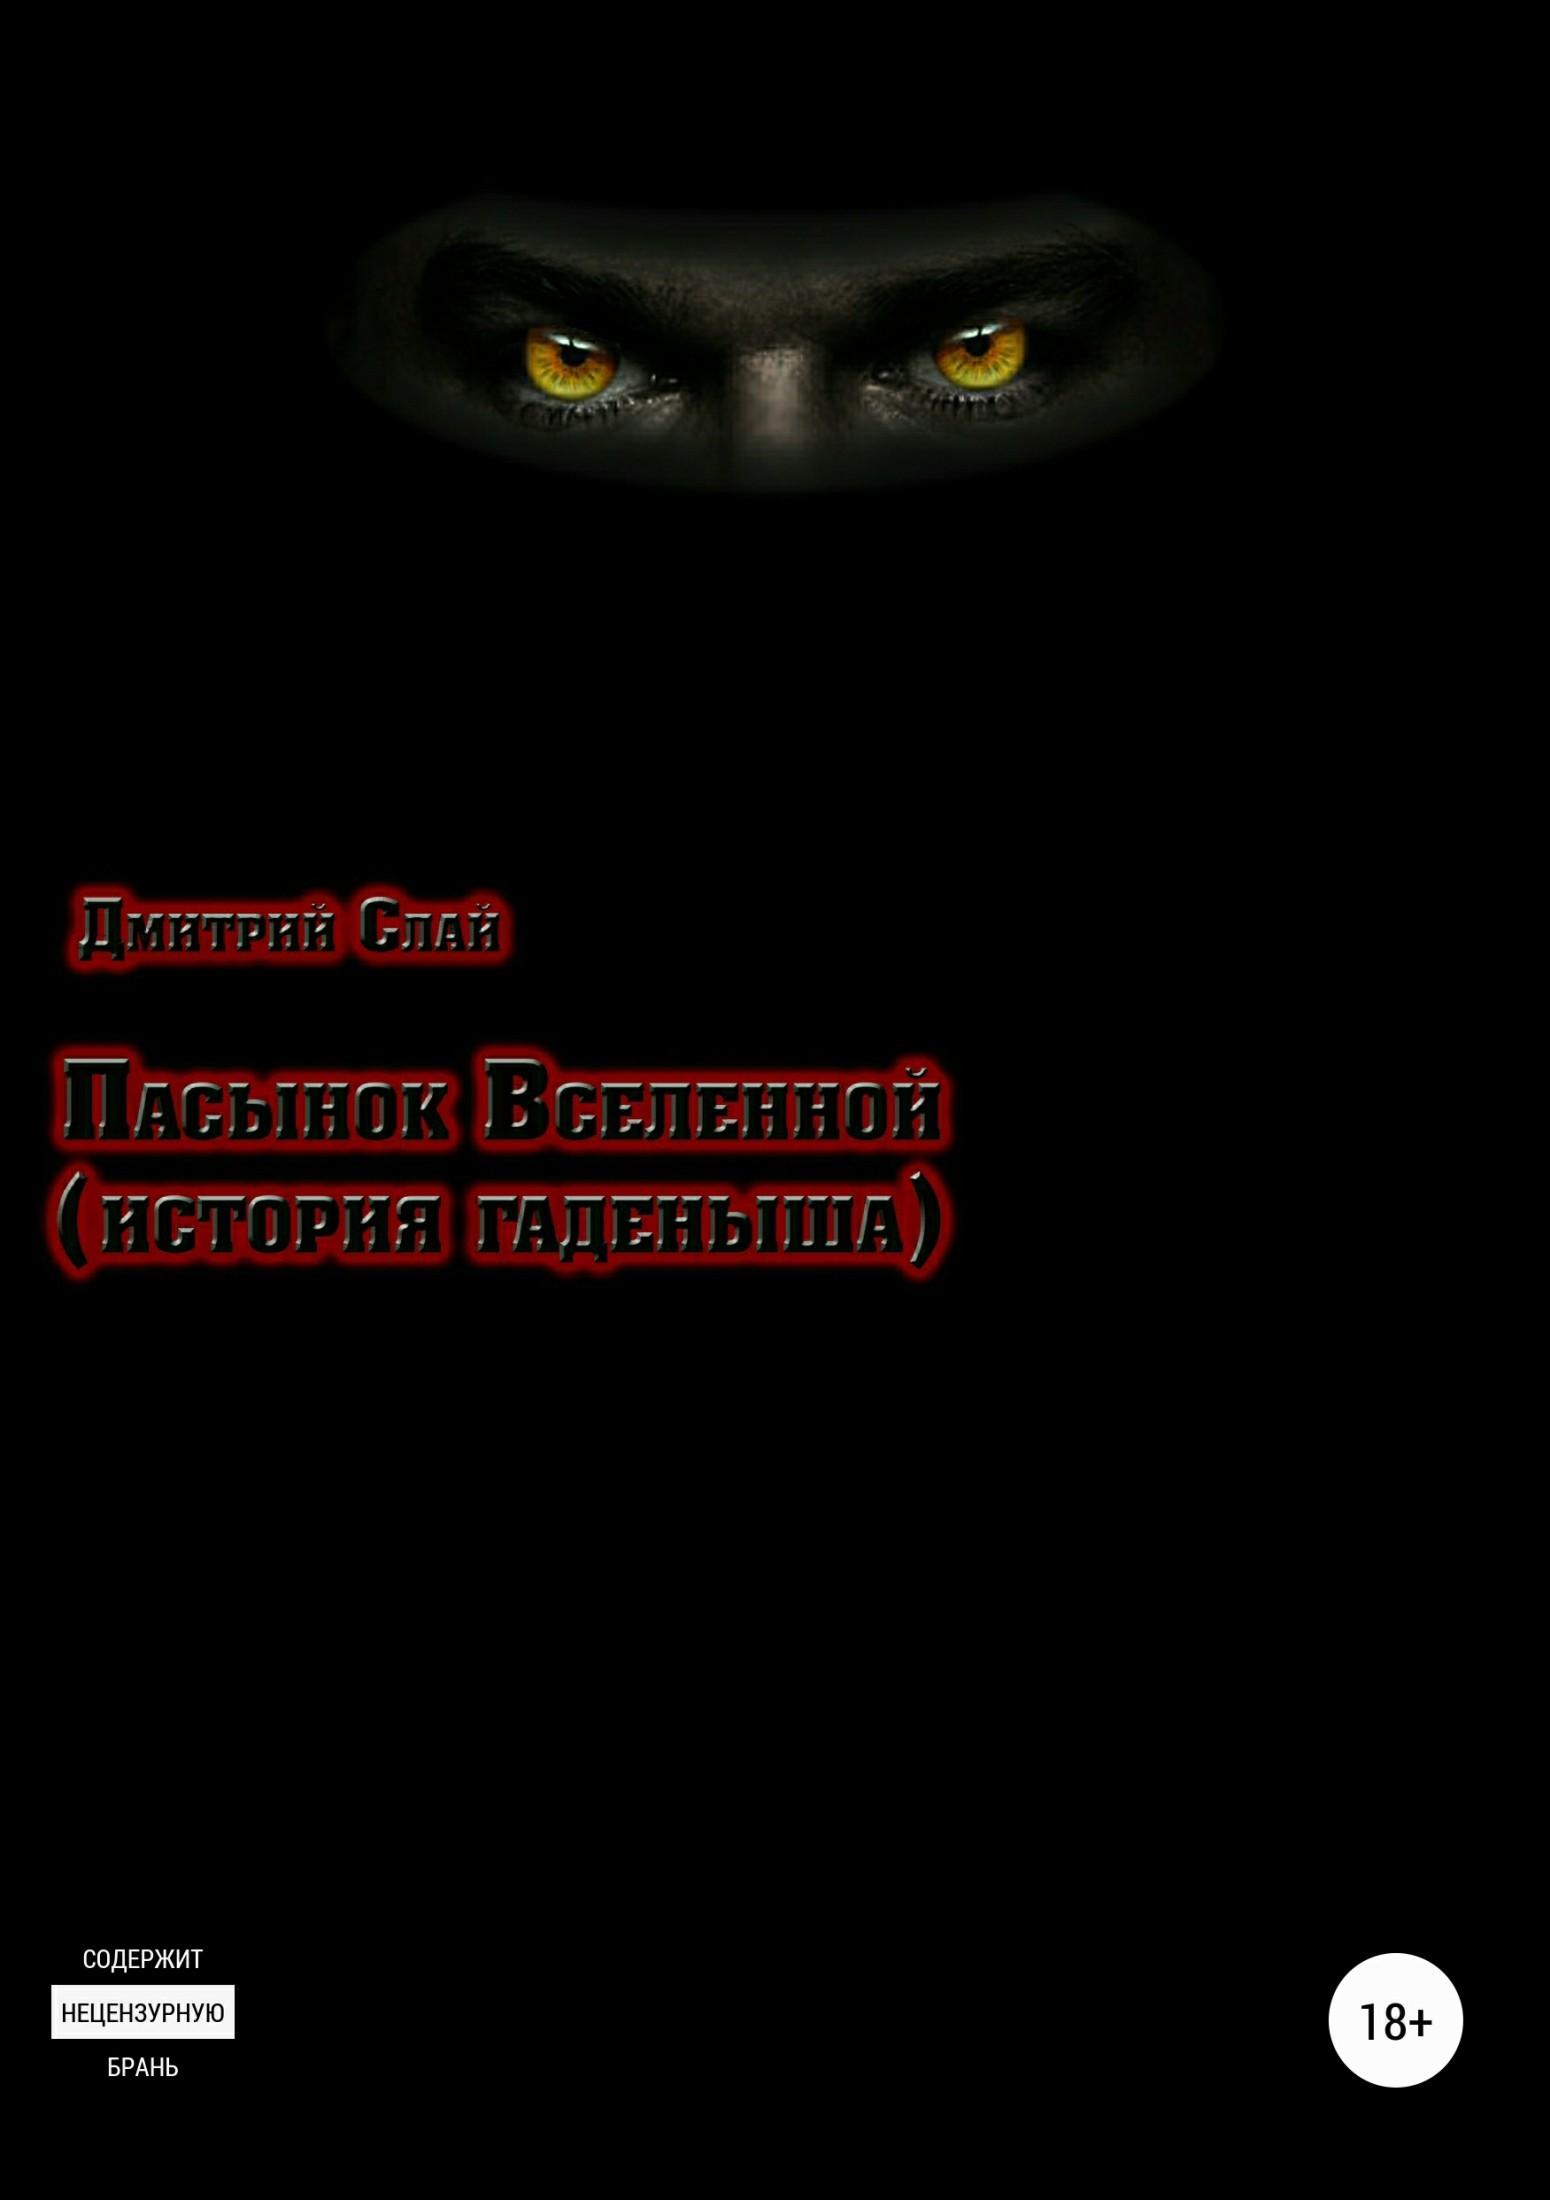 Дмитрий Слай бесплатно